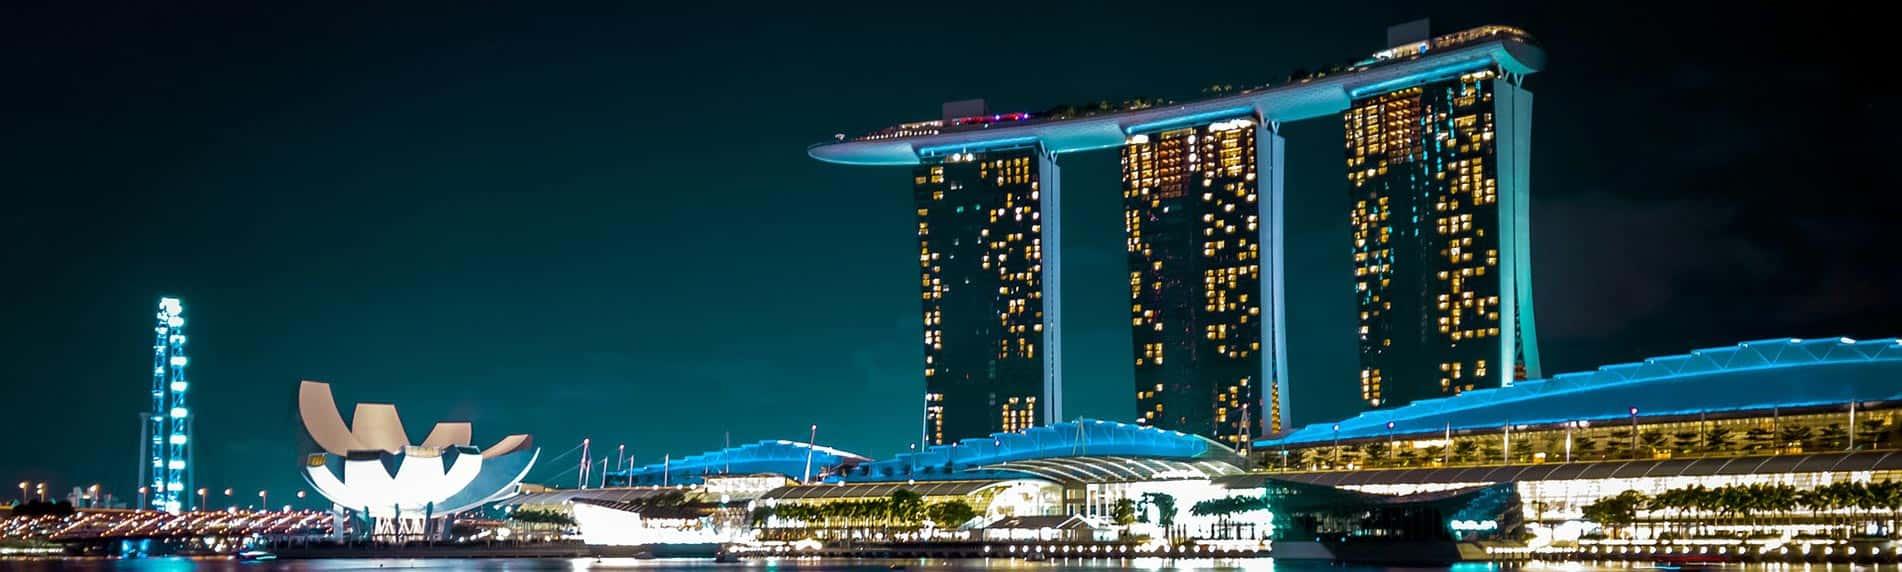 Singapore Honeymoon Delights 5 Nights